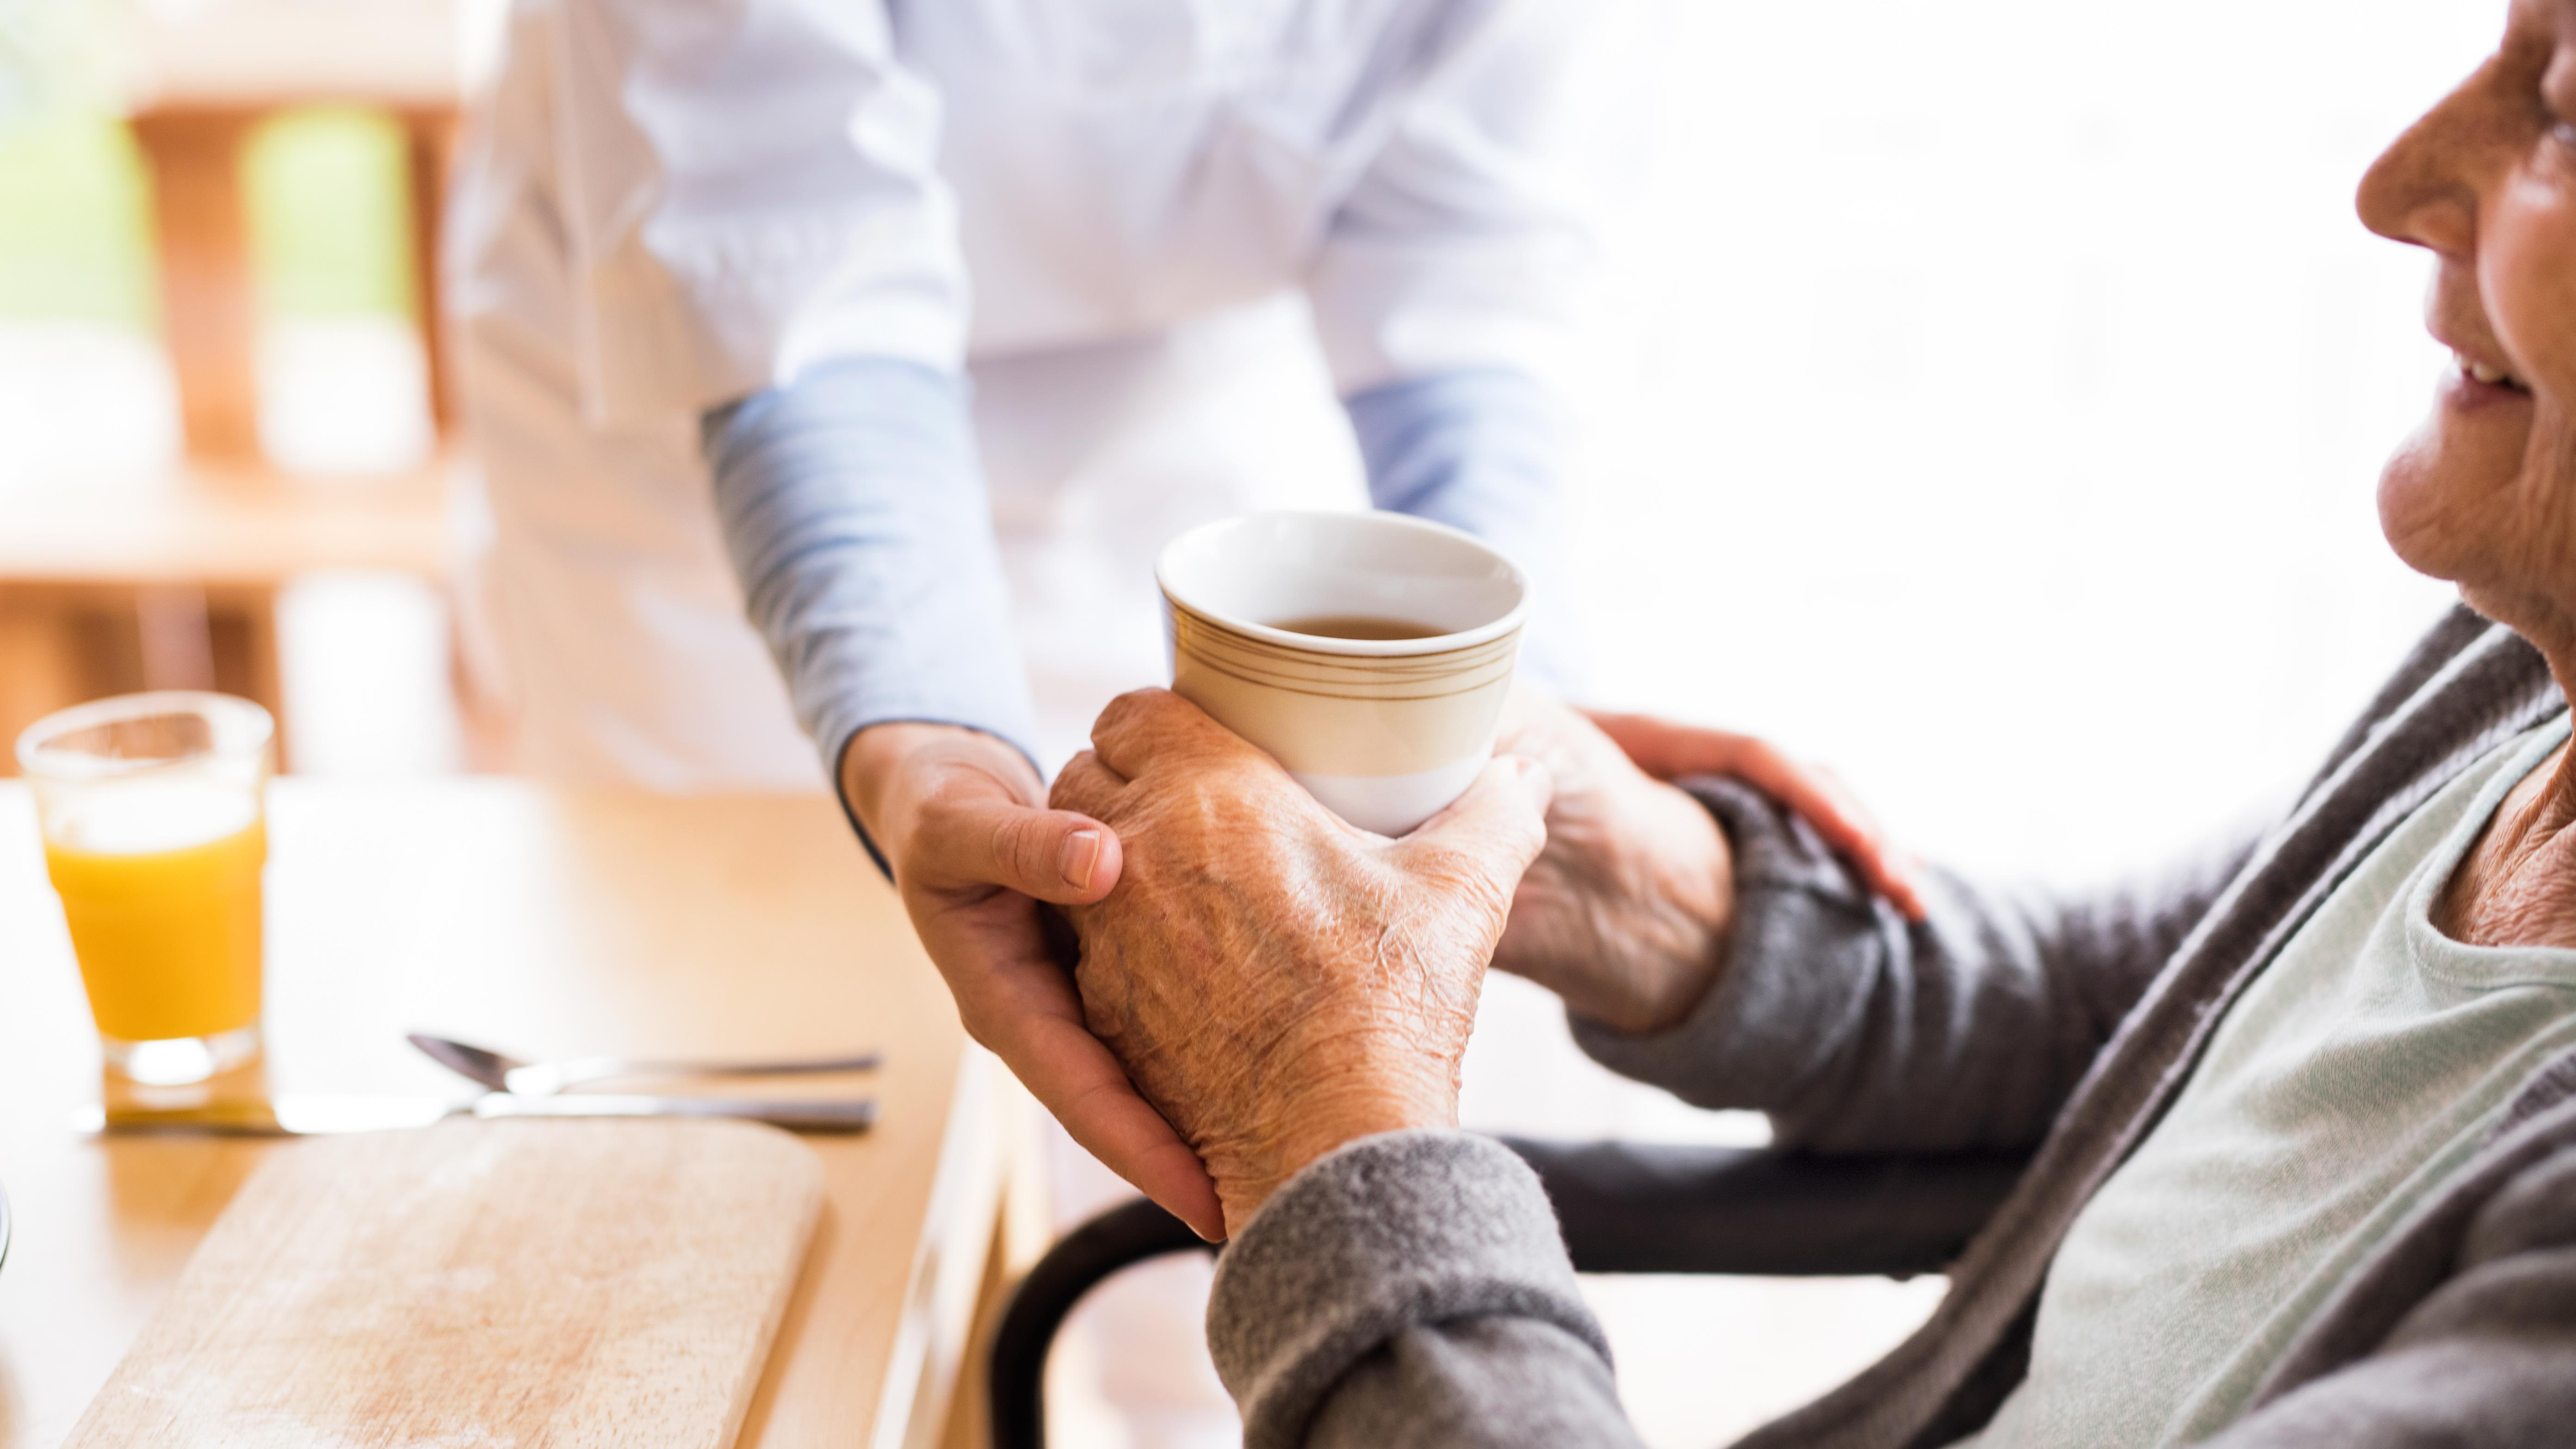 Failliete zorginstelling IkZijnWij droeg jaar lang geen pensioenpremies af